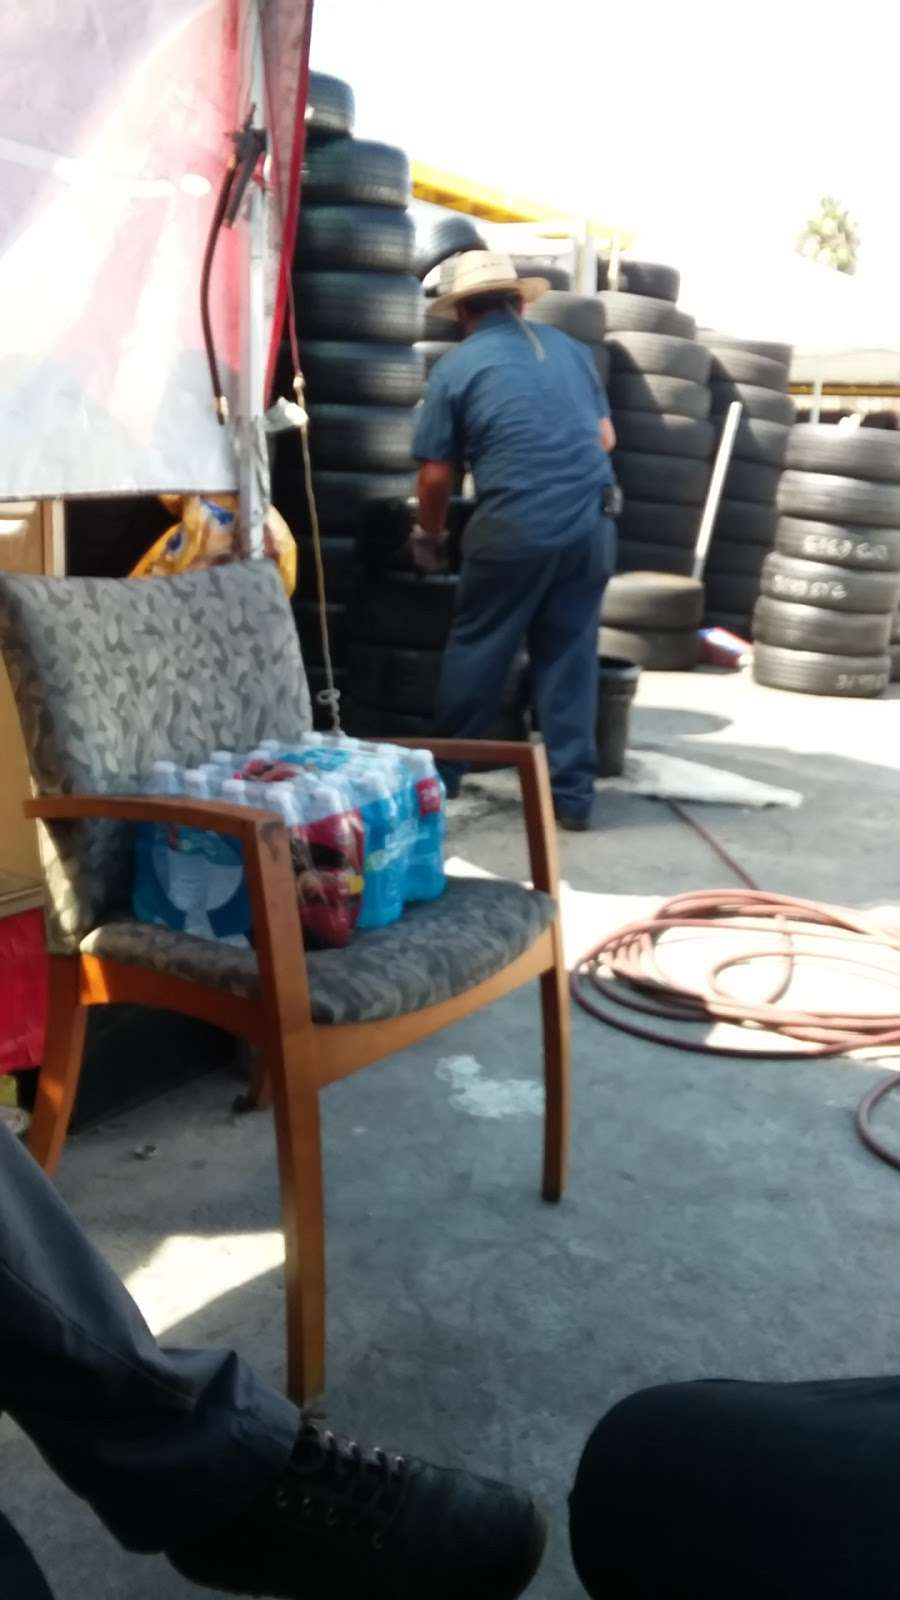 Leon Tires & Wheels - car repair  | Photo 6 of 10 | Address: 8431 S Main St, Los Angeles, CA 90003, USA | Phone: (323) 456-5405